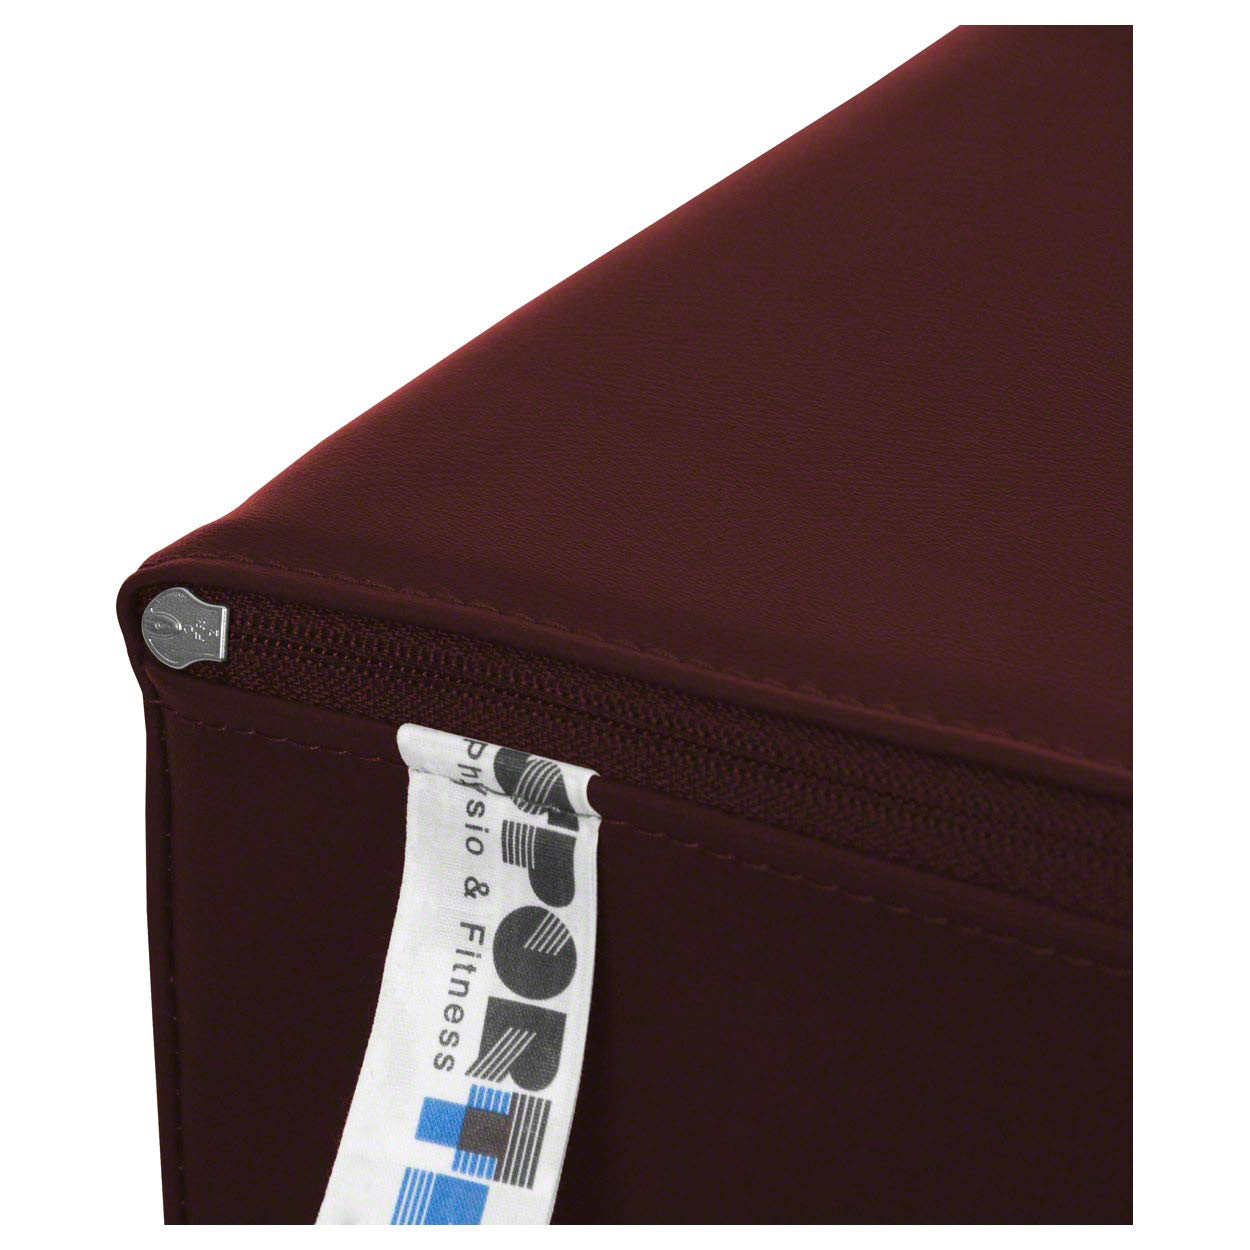 Lagerungsw/ürfel Stufenlagerungsw/ürfel Bandscheibenw/ürfel Sitzw/ürfel 30x30x30 cm